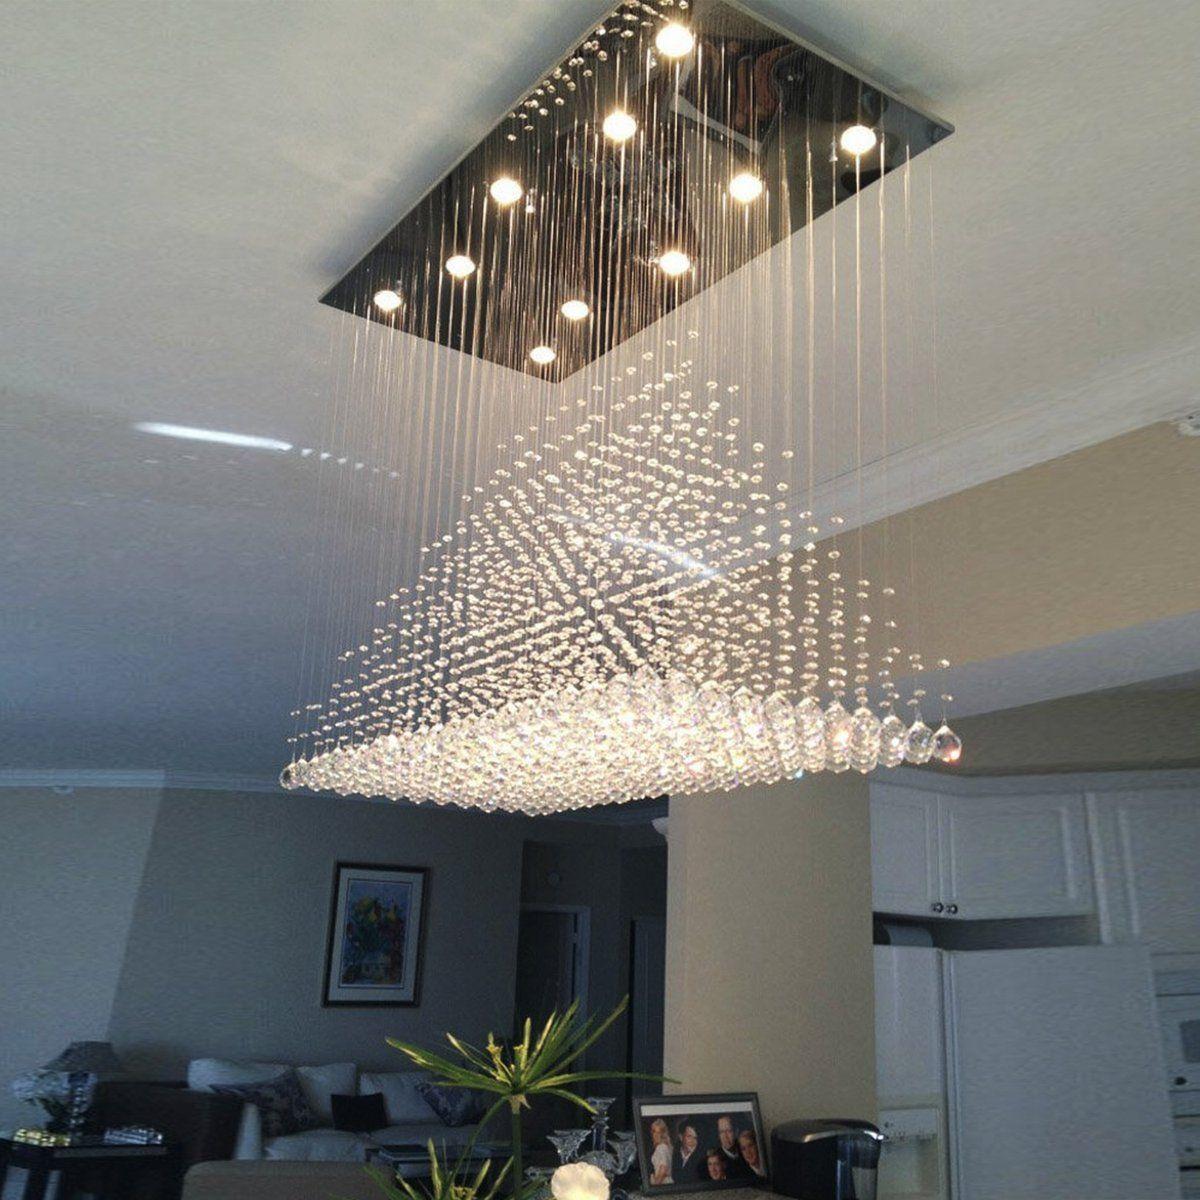 Rectangular Base Pyramid Raindrop Crystal Ceiling Lights Modern Lighting Chandeliers Crystal Ceiling Light Dining Room Lighting